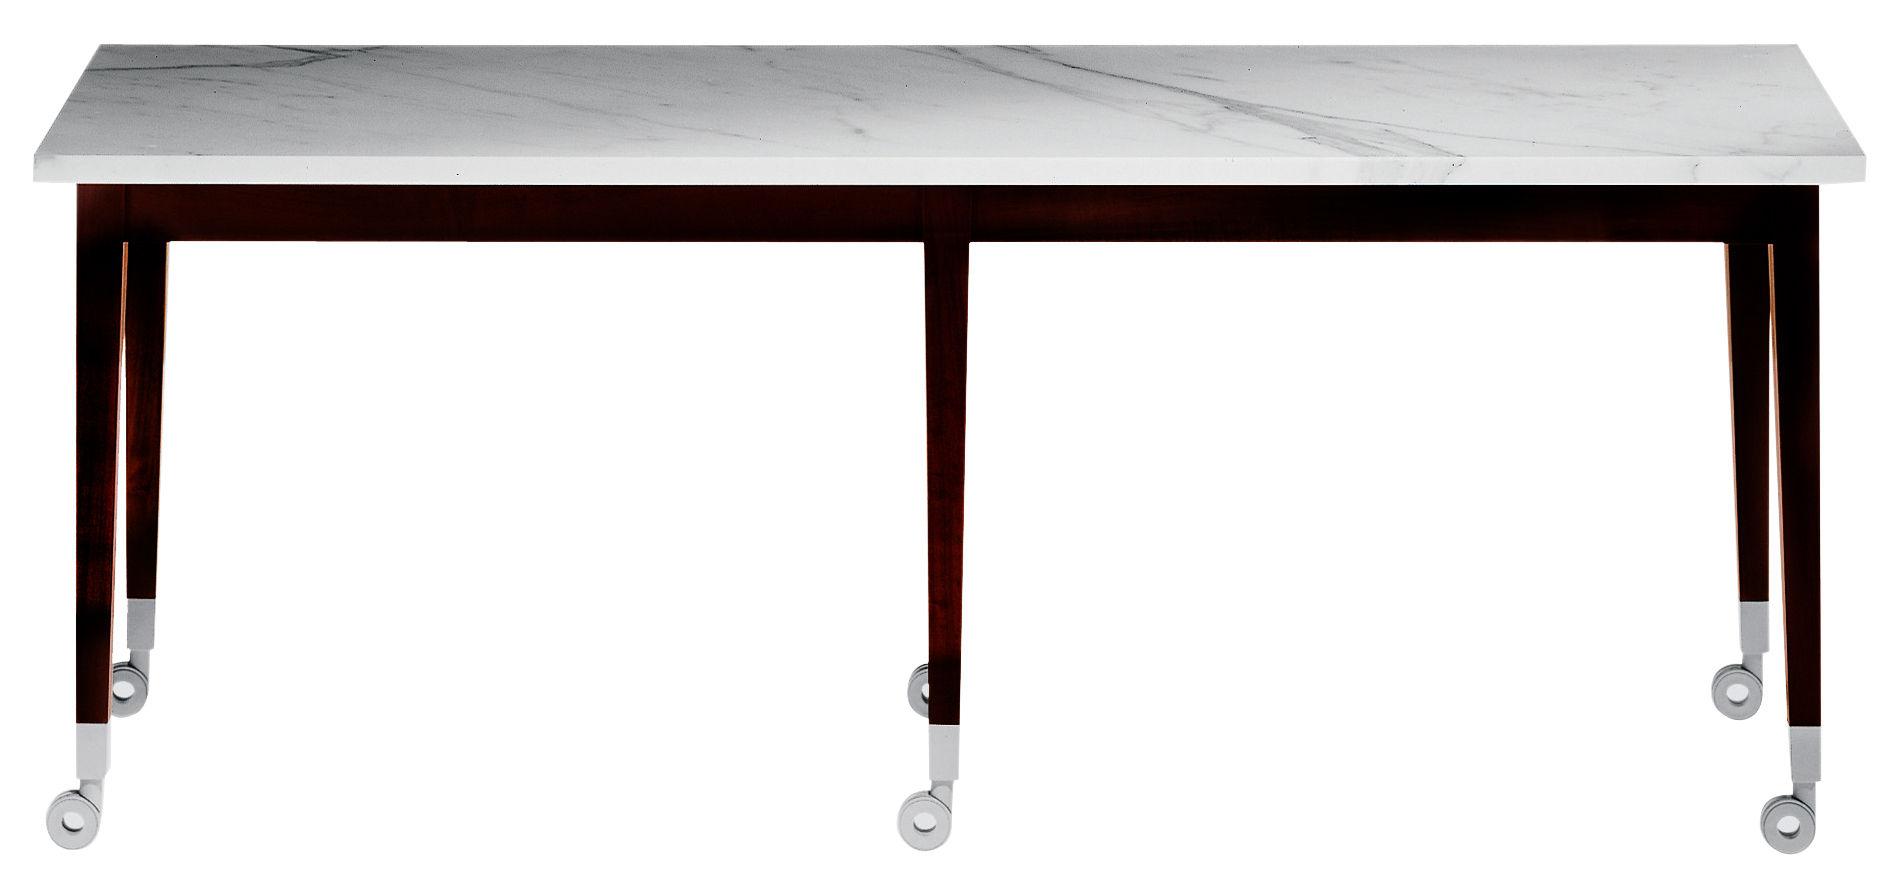 Table basse neoz rectangulaire eb ne marbre driade - Table en marbre rectangulaire ...